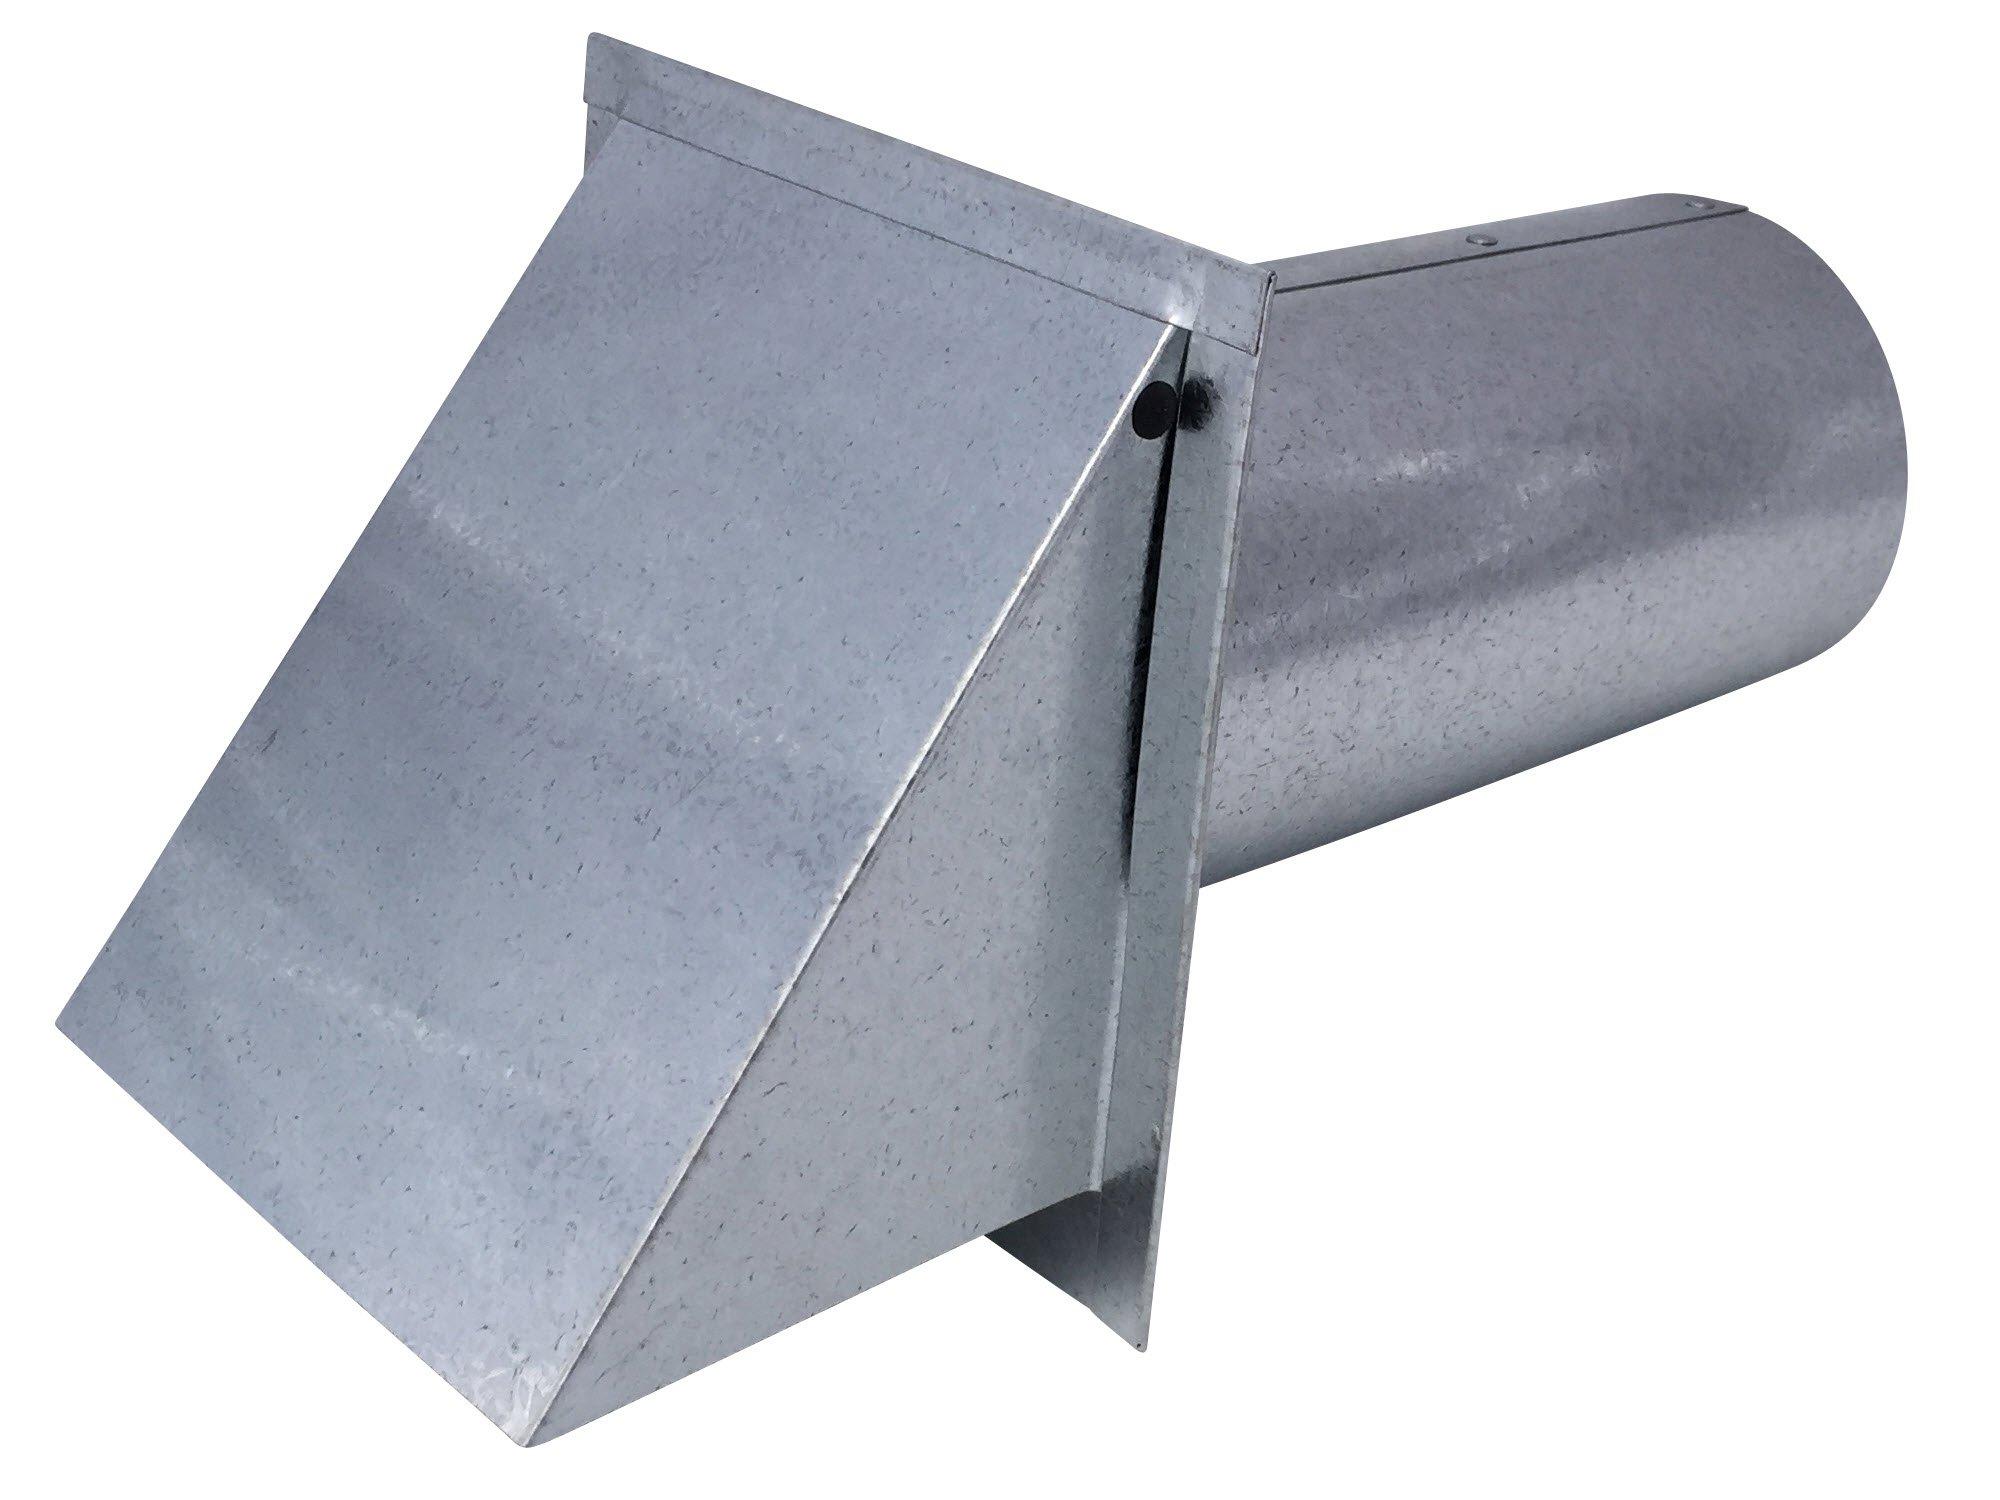 4 Inch Wall Vent Galvanized Damper & Screen (4 Inch Diameter) - Vent Works